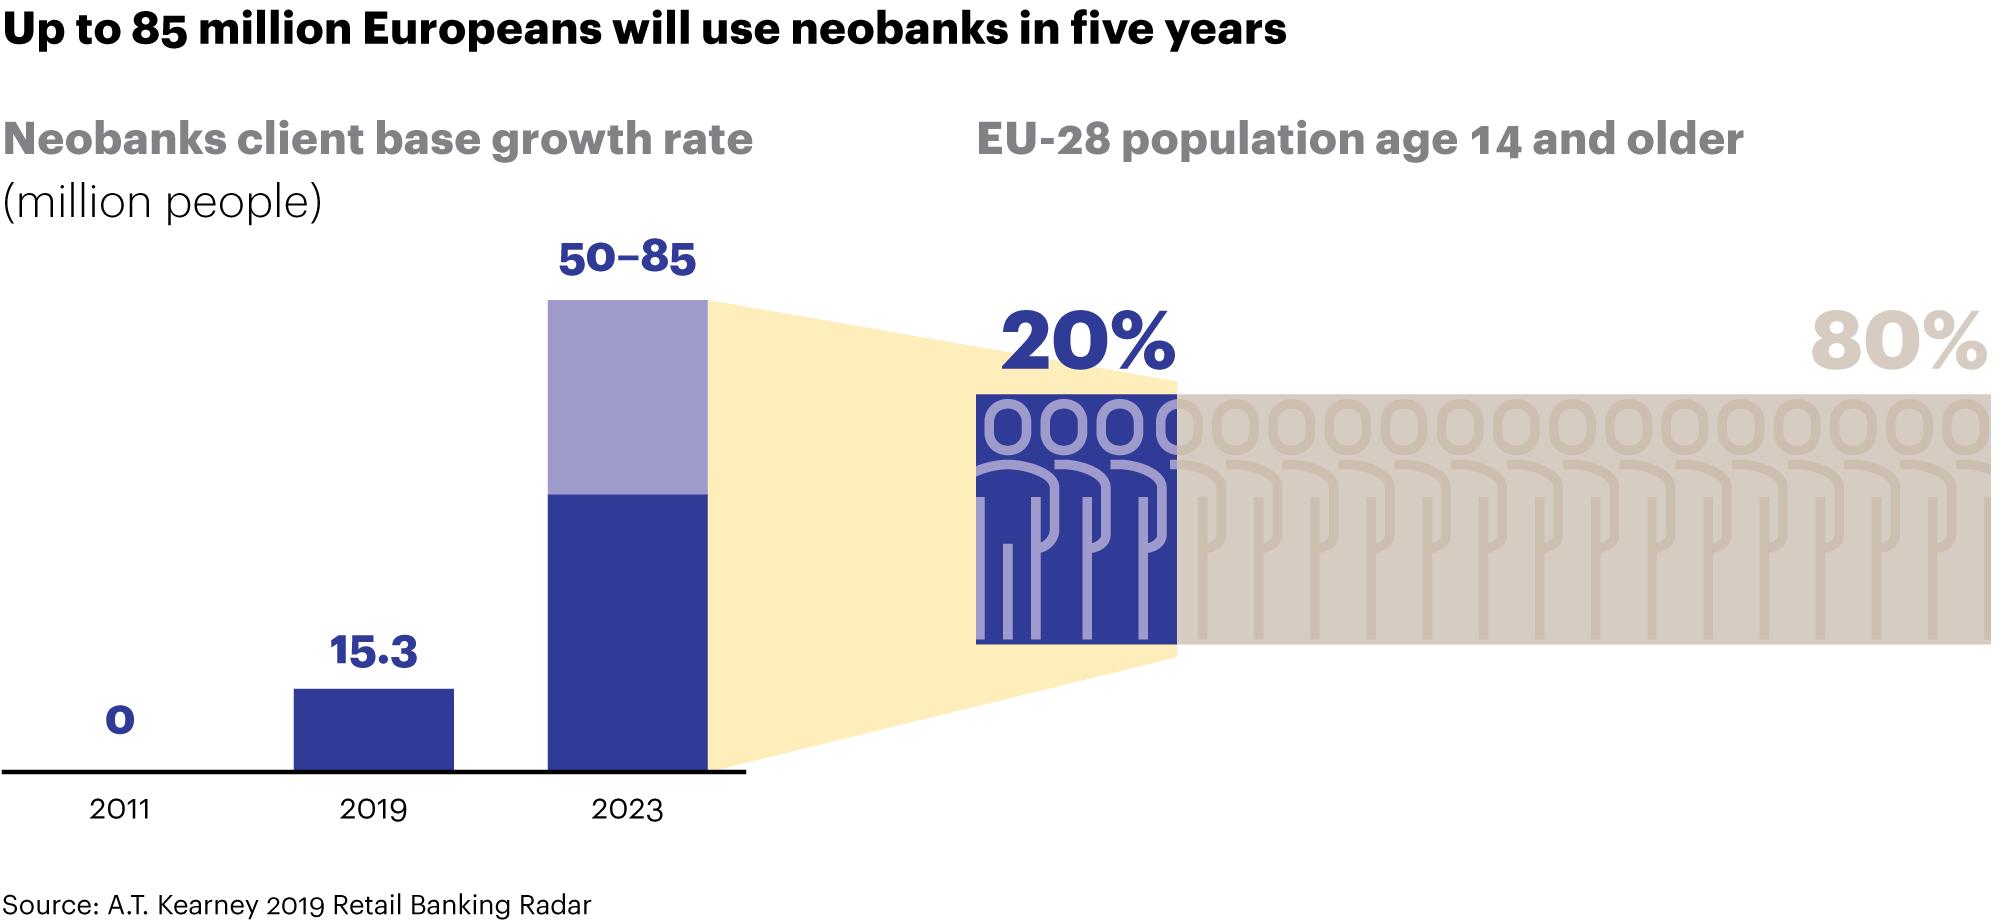 Neobank customer growth